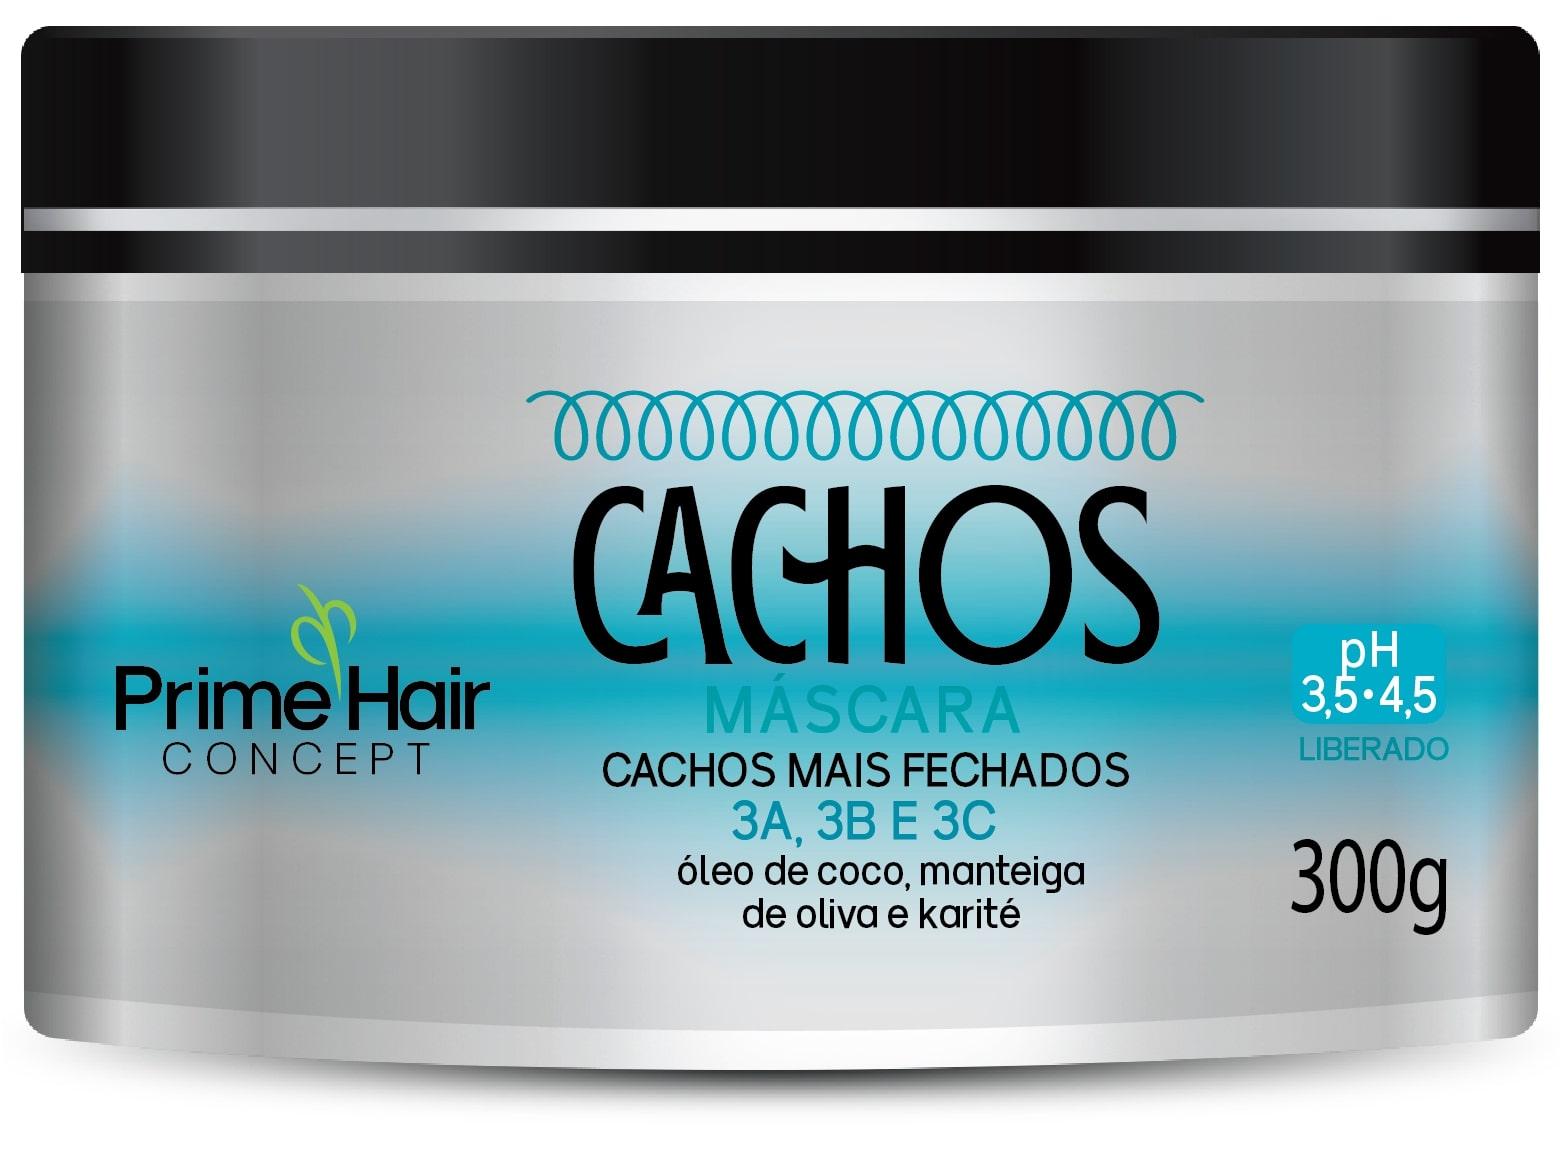 MASCARA PRIME HAIR 300G CACHOS-CACHO+FECHAD